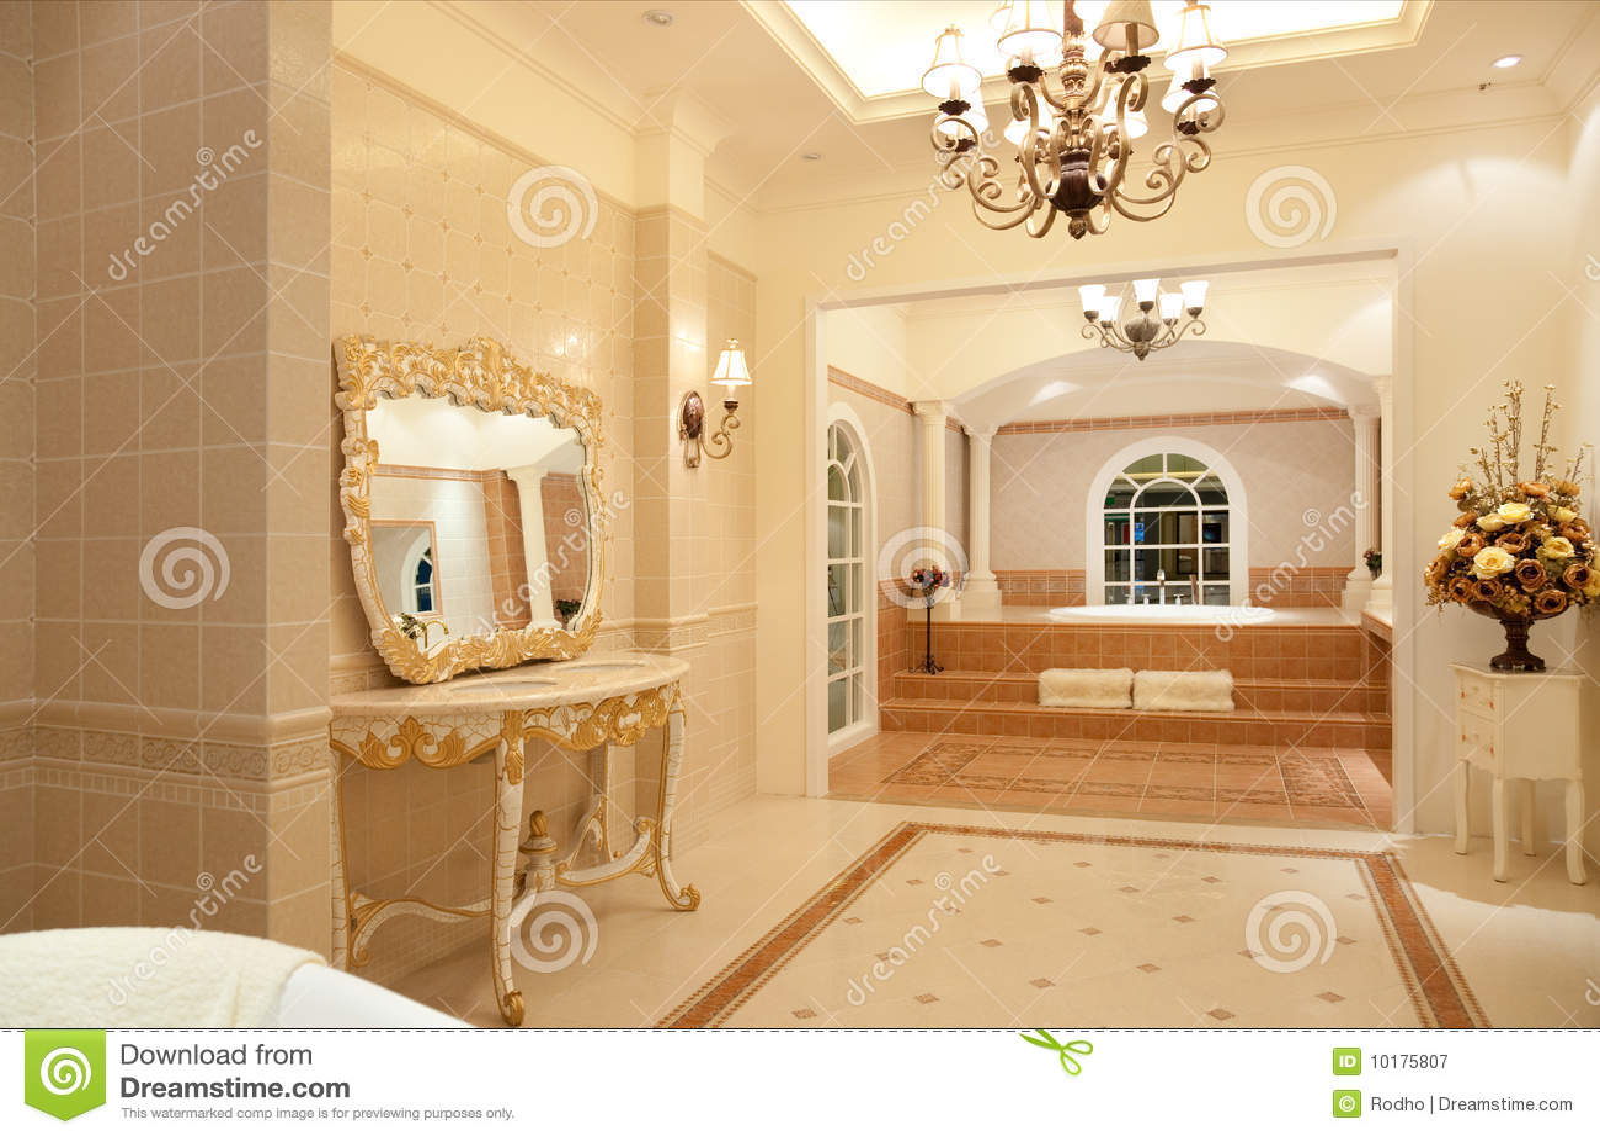 Luxury master bathroom stock image image of bathroom 10175807 - Image of bath room ...